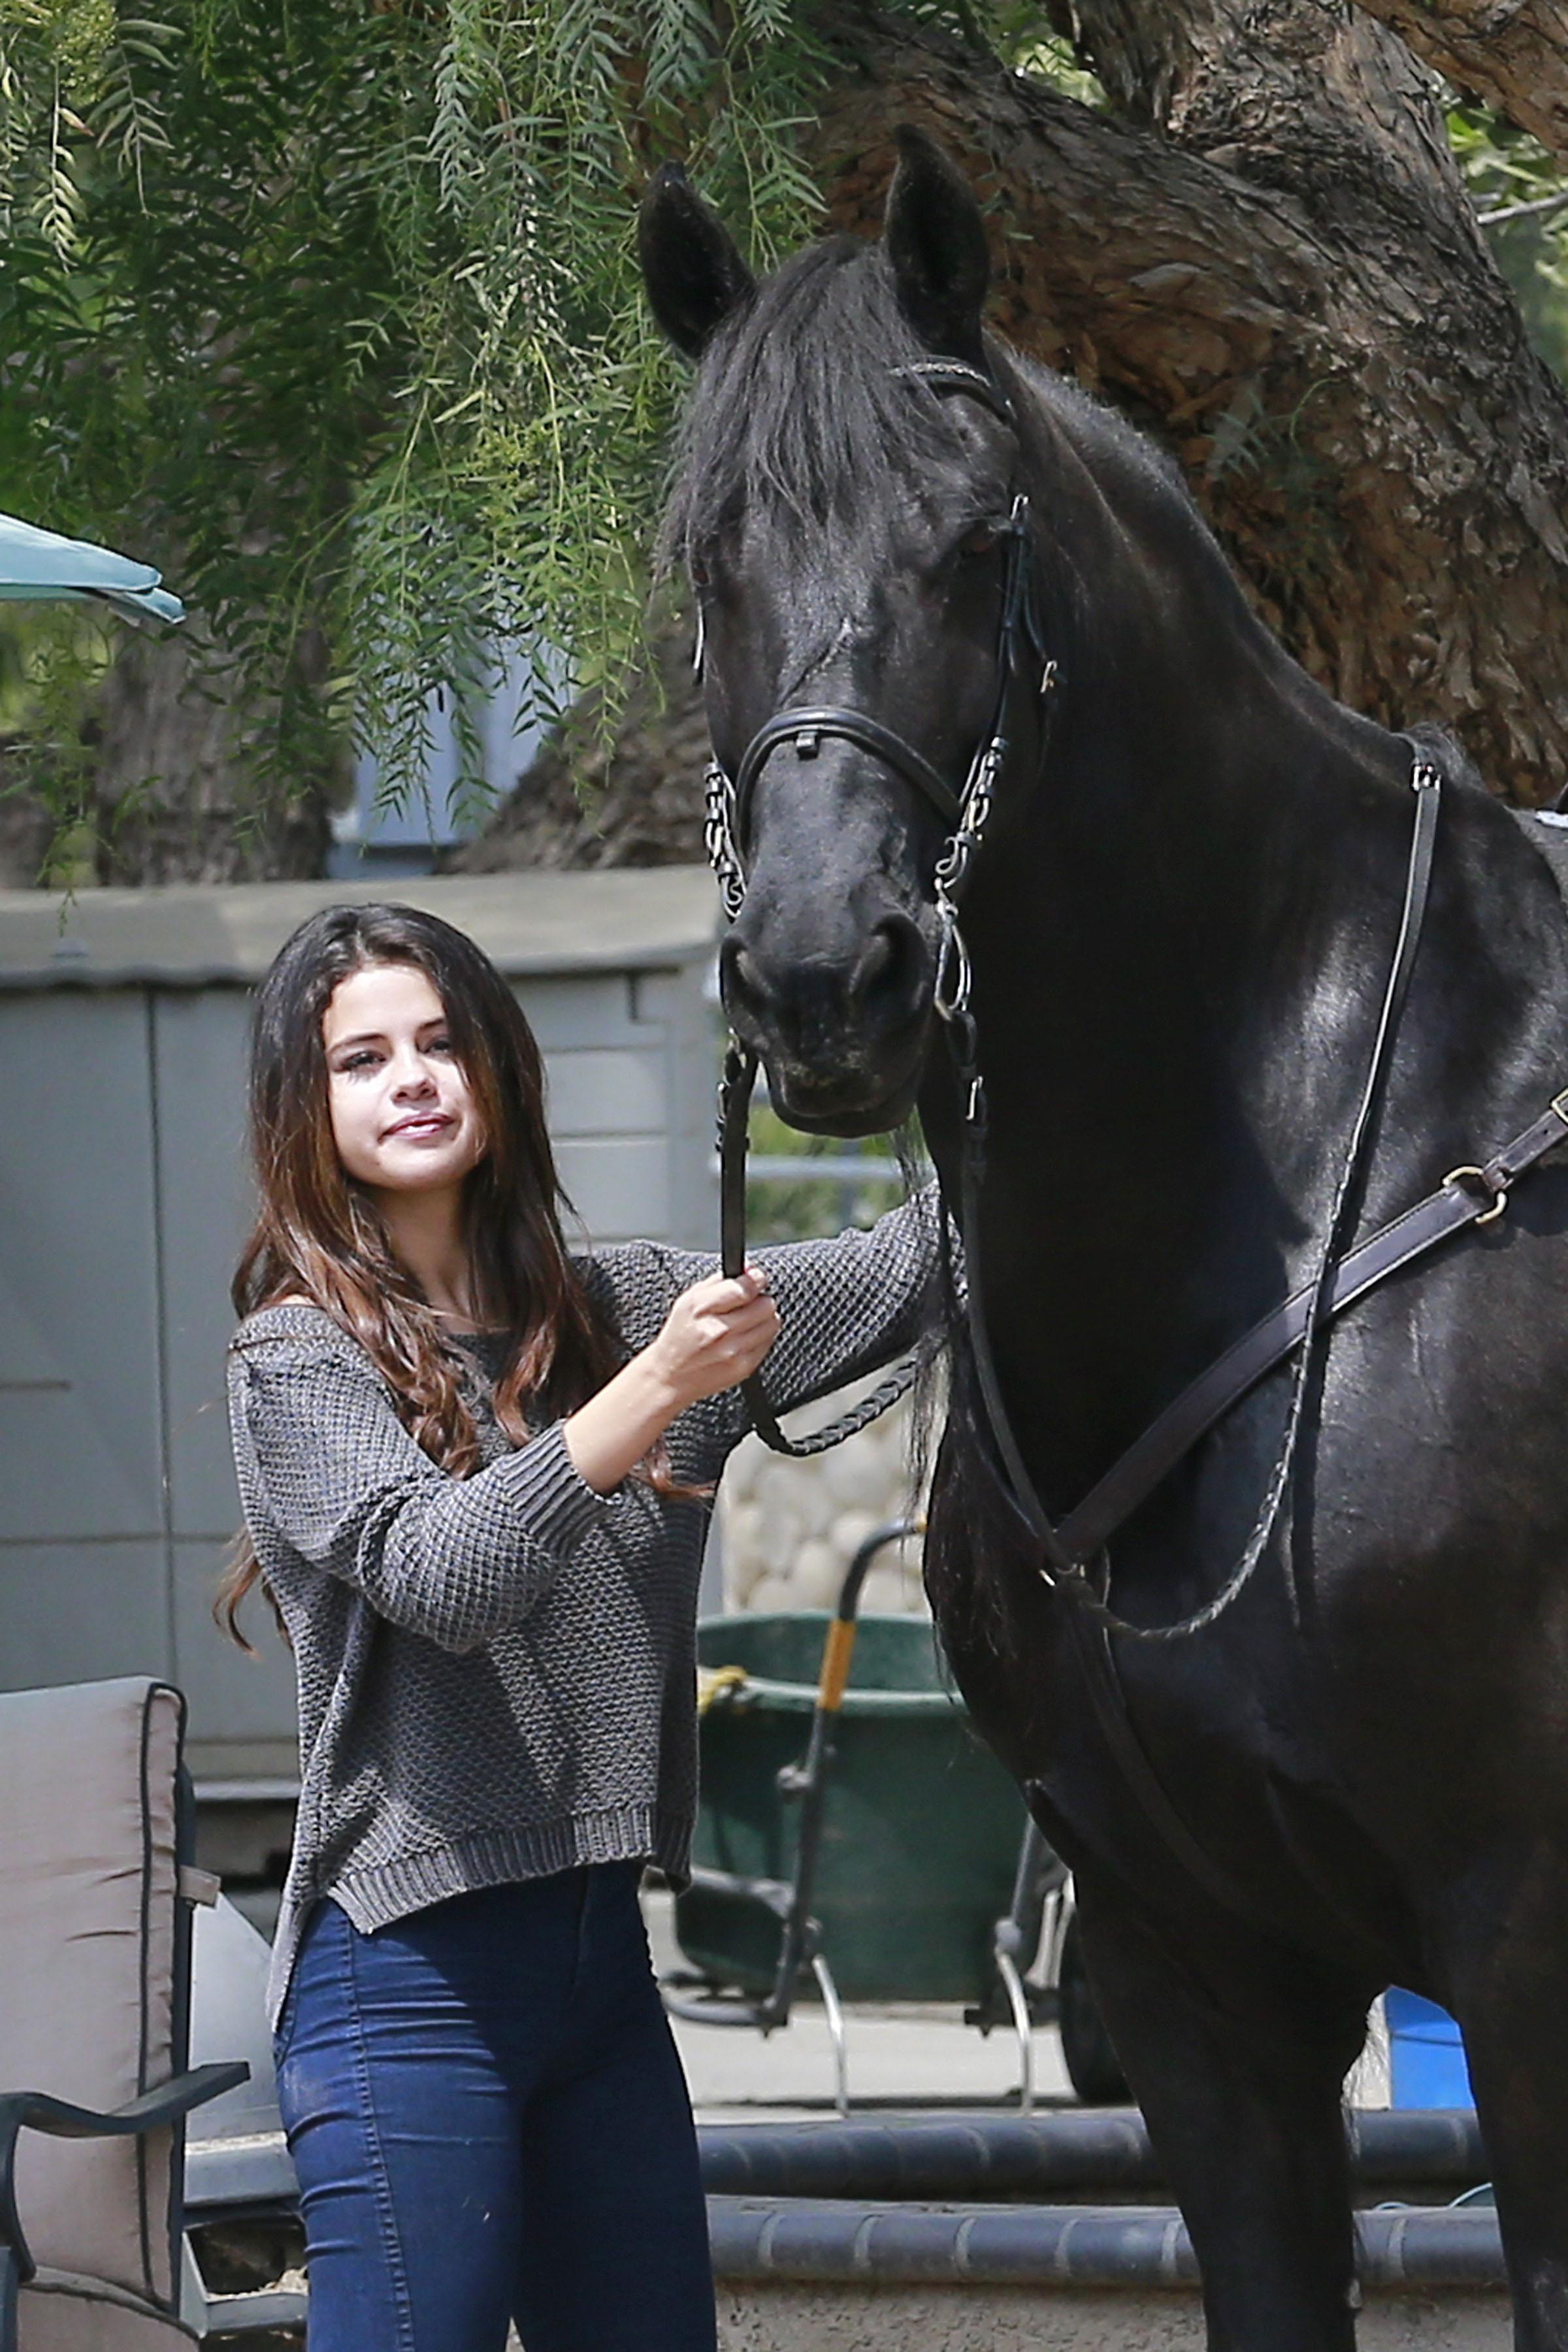 Giddy Up Selena Gomez Spends Her Friday On Horseback  See The Cute Pics  TeenInfoNet